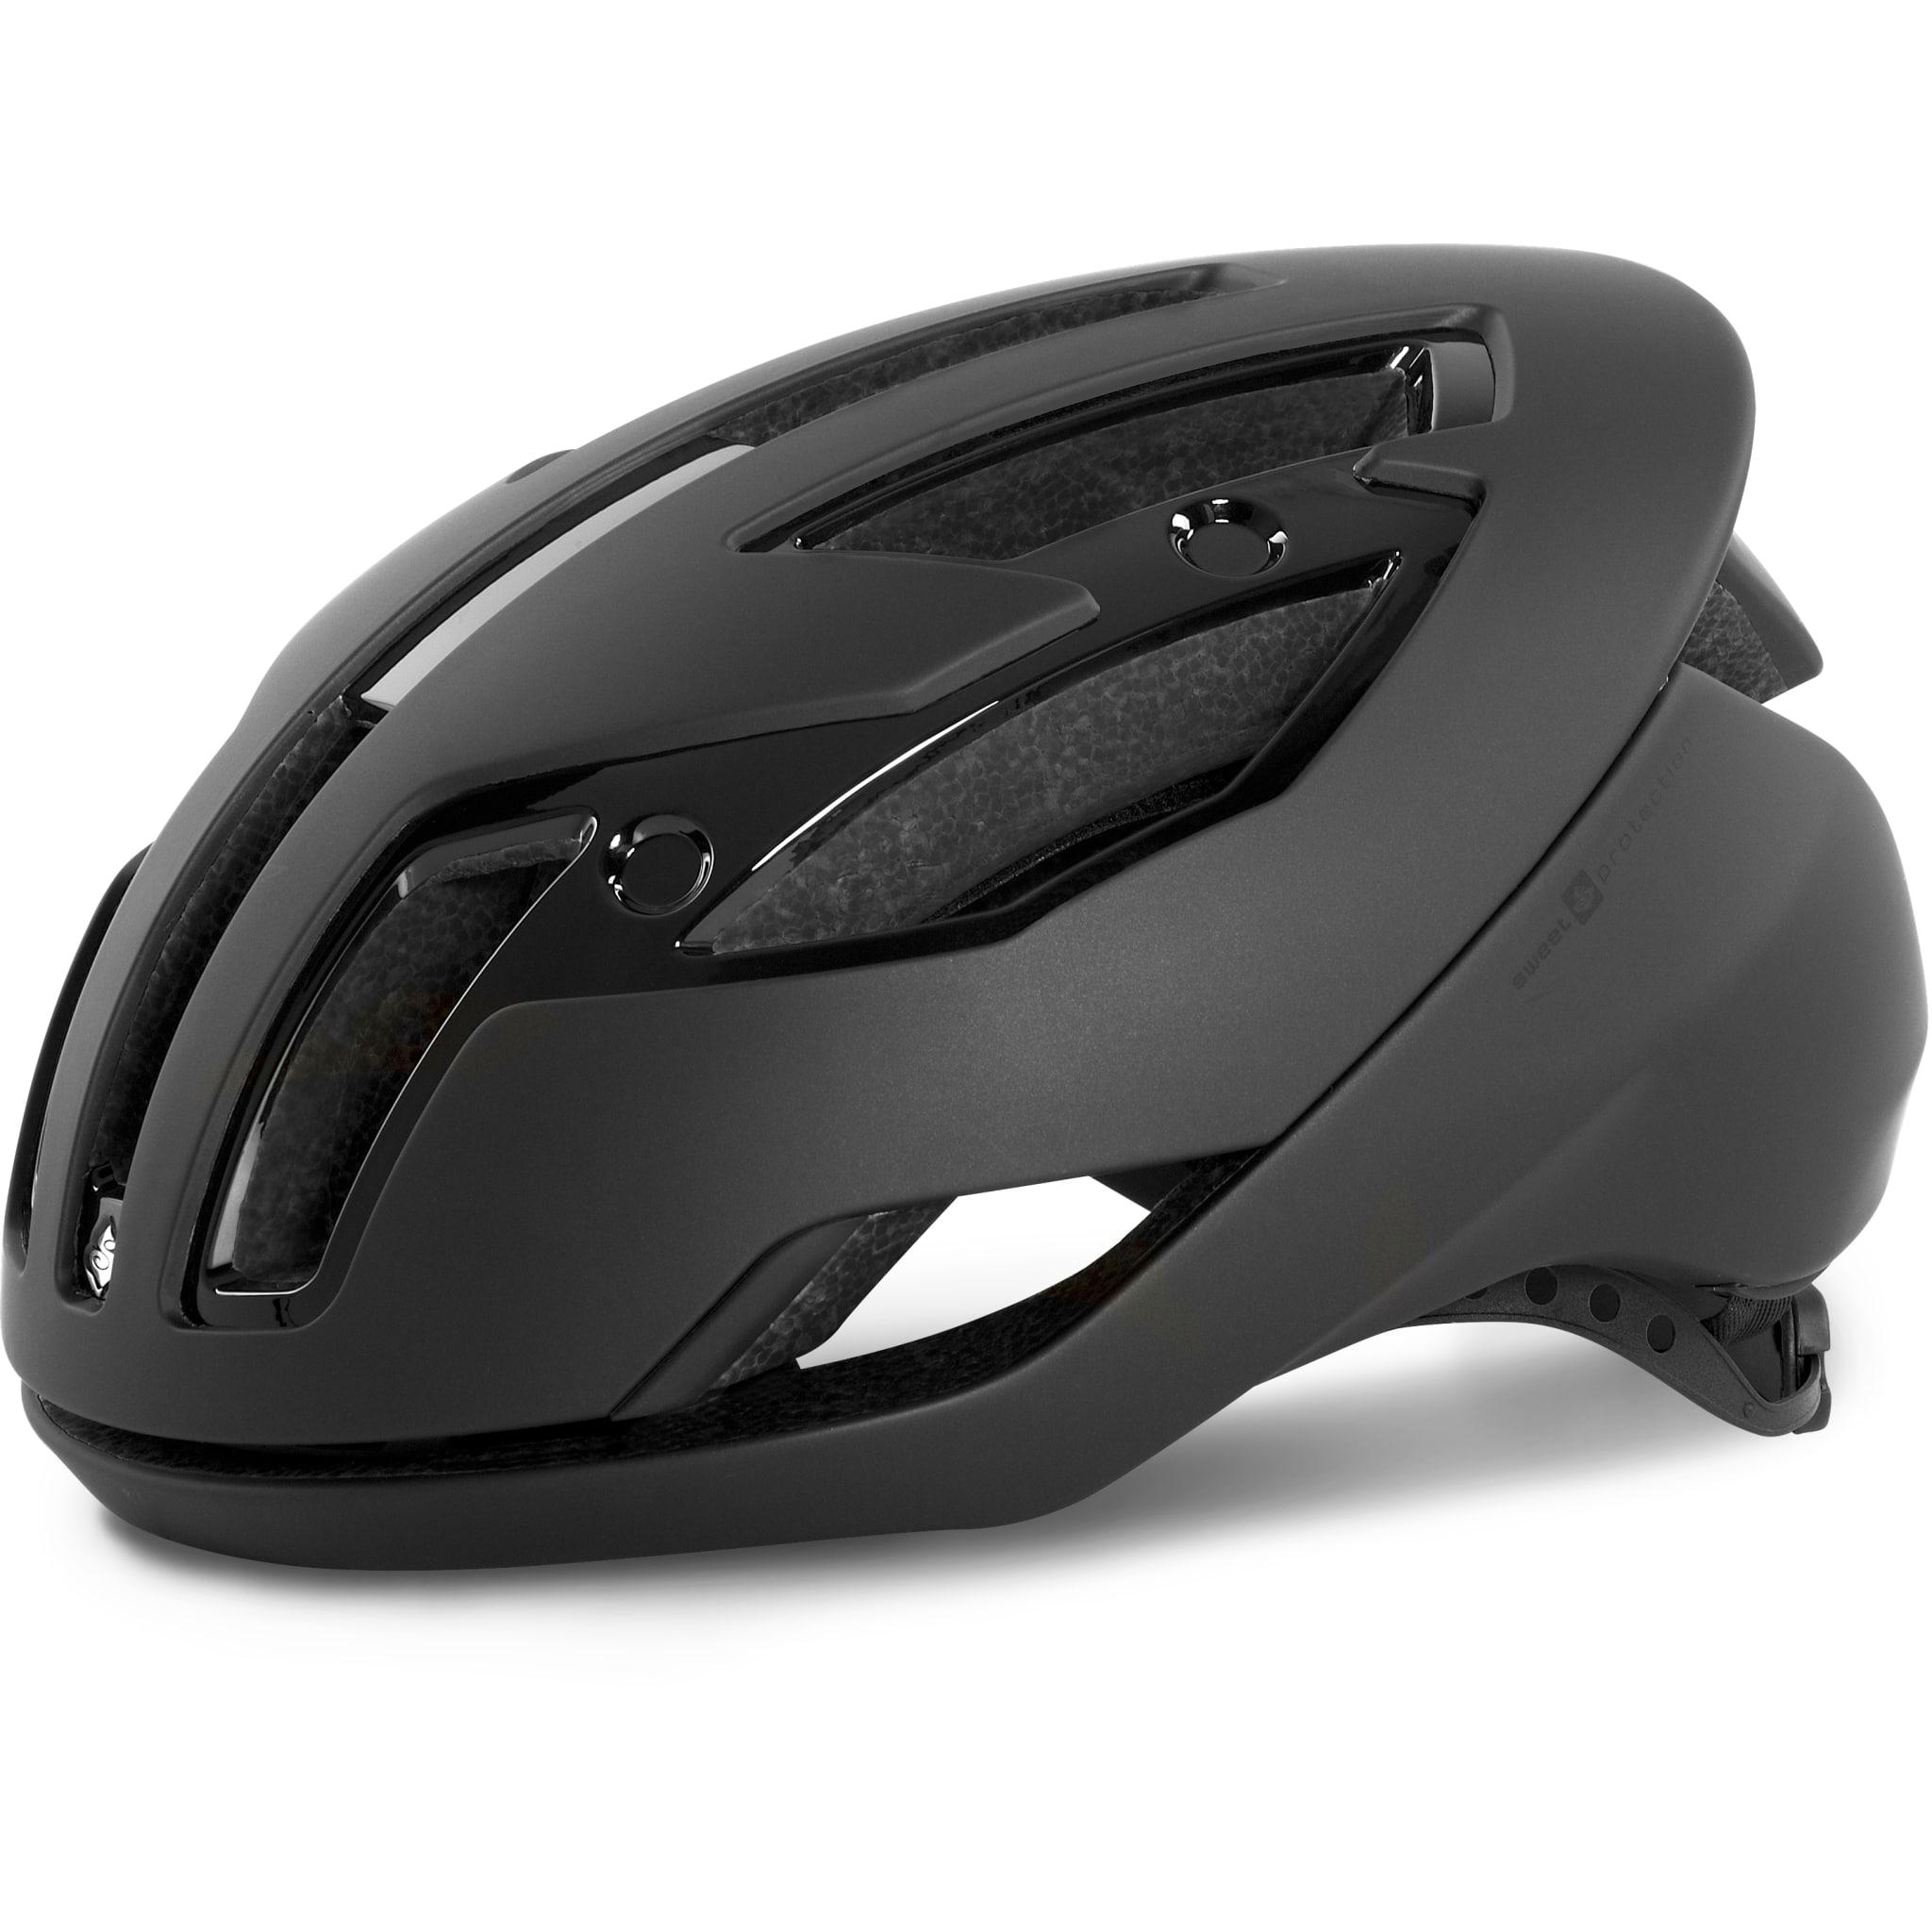 Falconer Aero Helmet